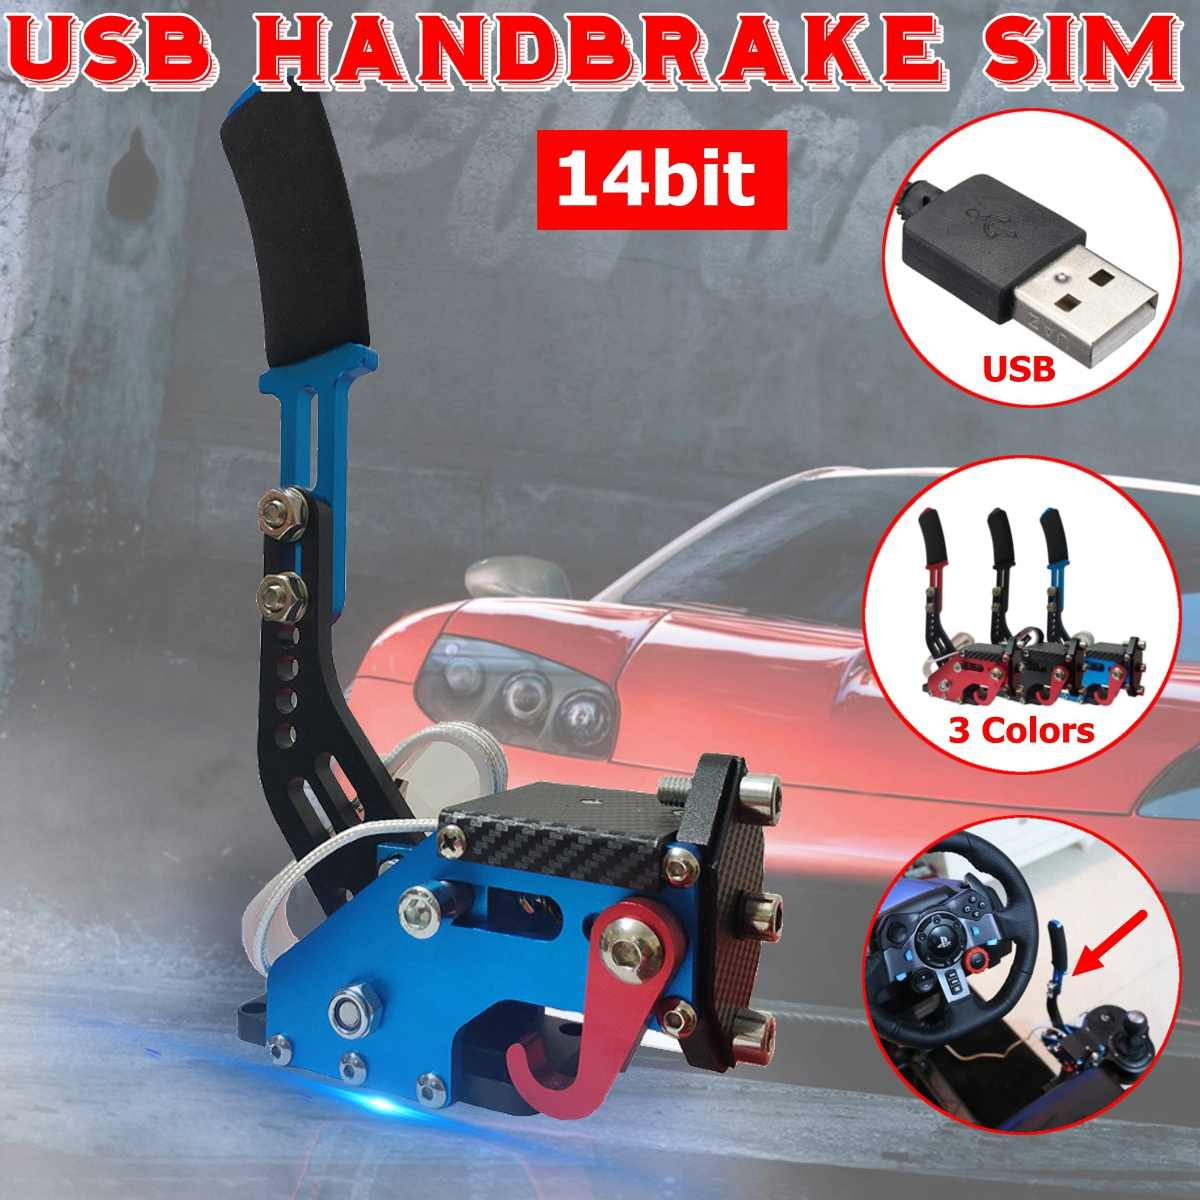 USB Handbrake Clamp PC Windows 14Bit PC For Sim Racing Game For Logitech G25 G27 G29 T500 T300 FANATECOSW For LFS DIRT RALLY